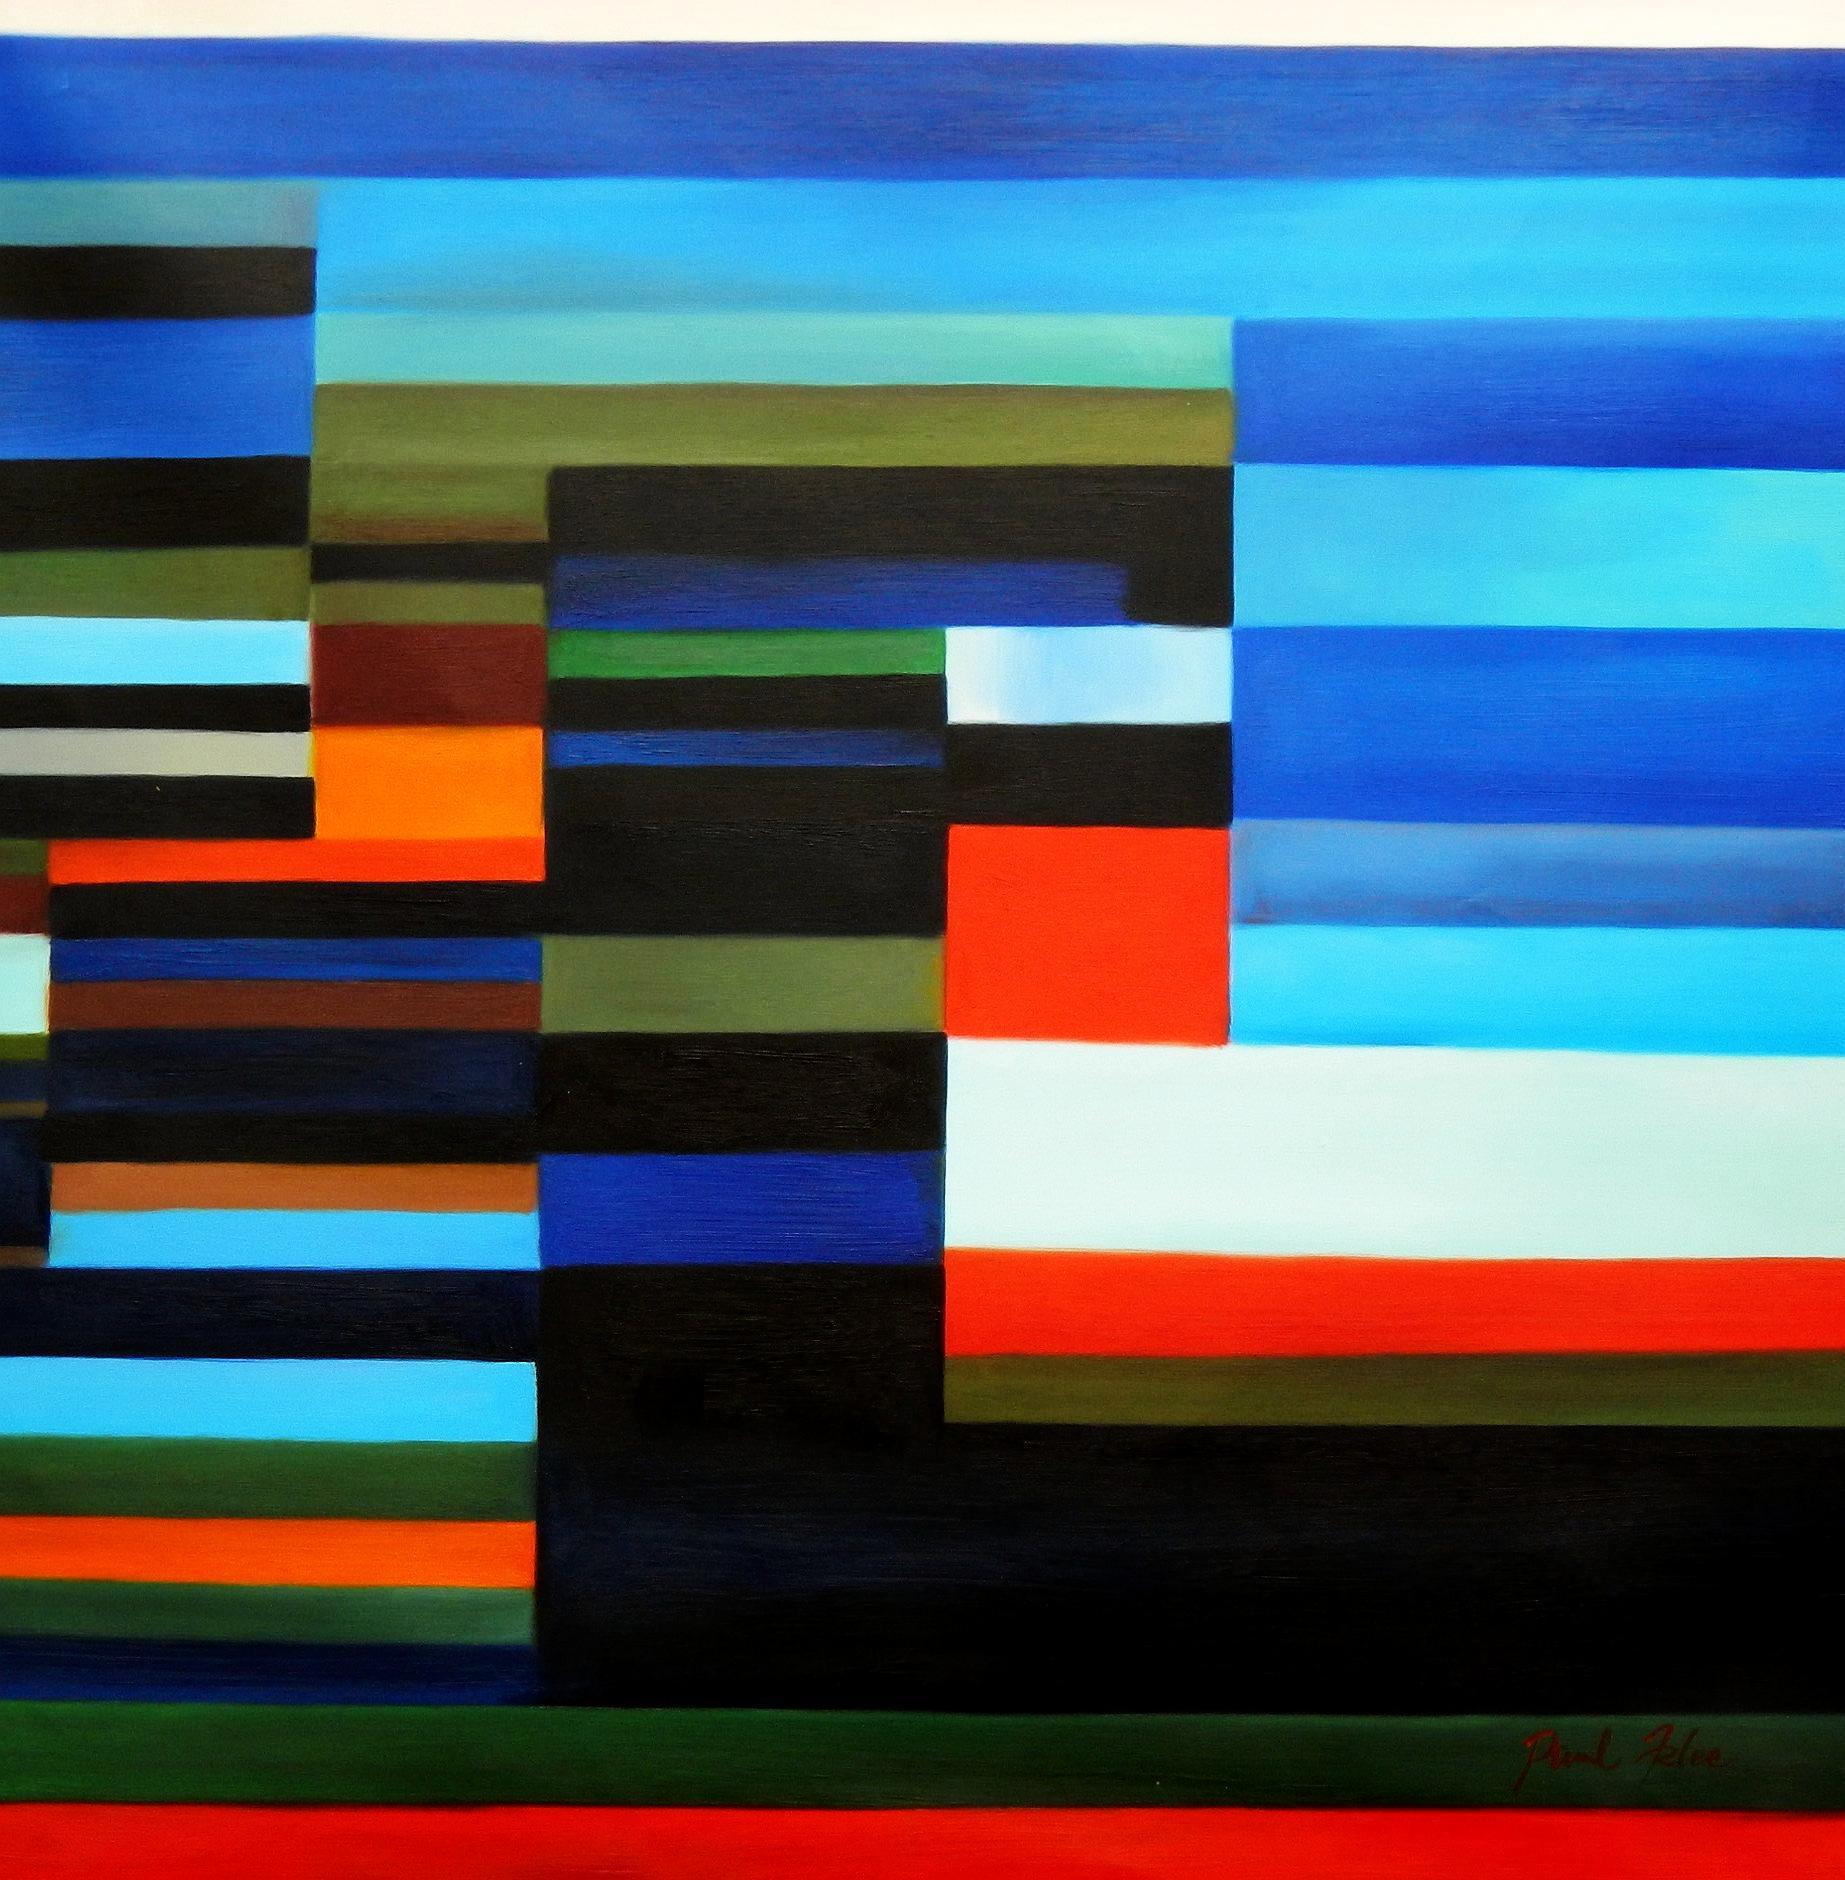 Paul Klee - Feuer am Abend h94678 90x90cm Ölgemälde handgemalt